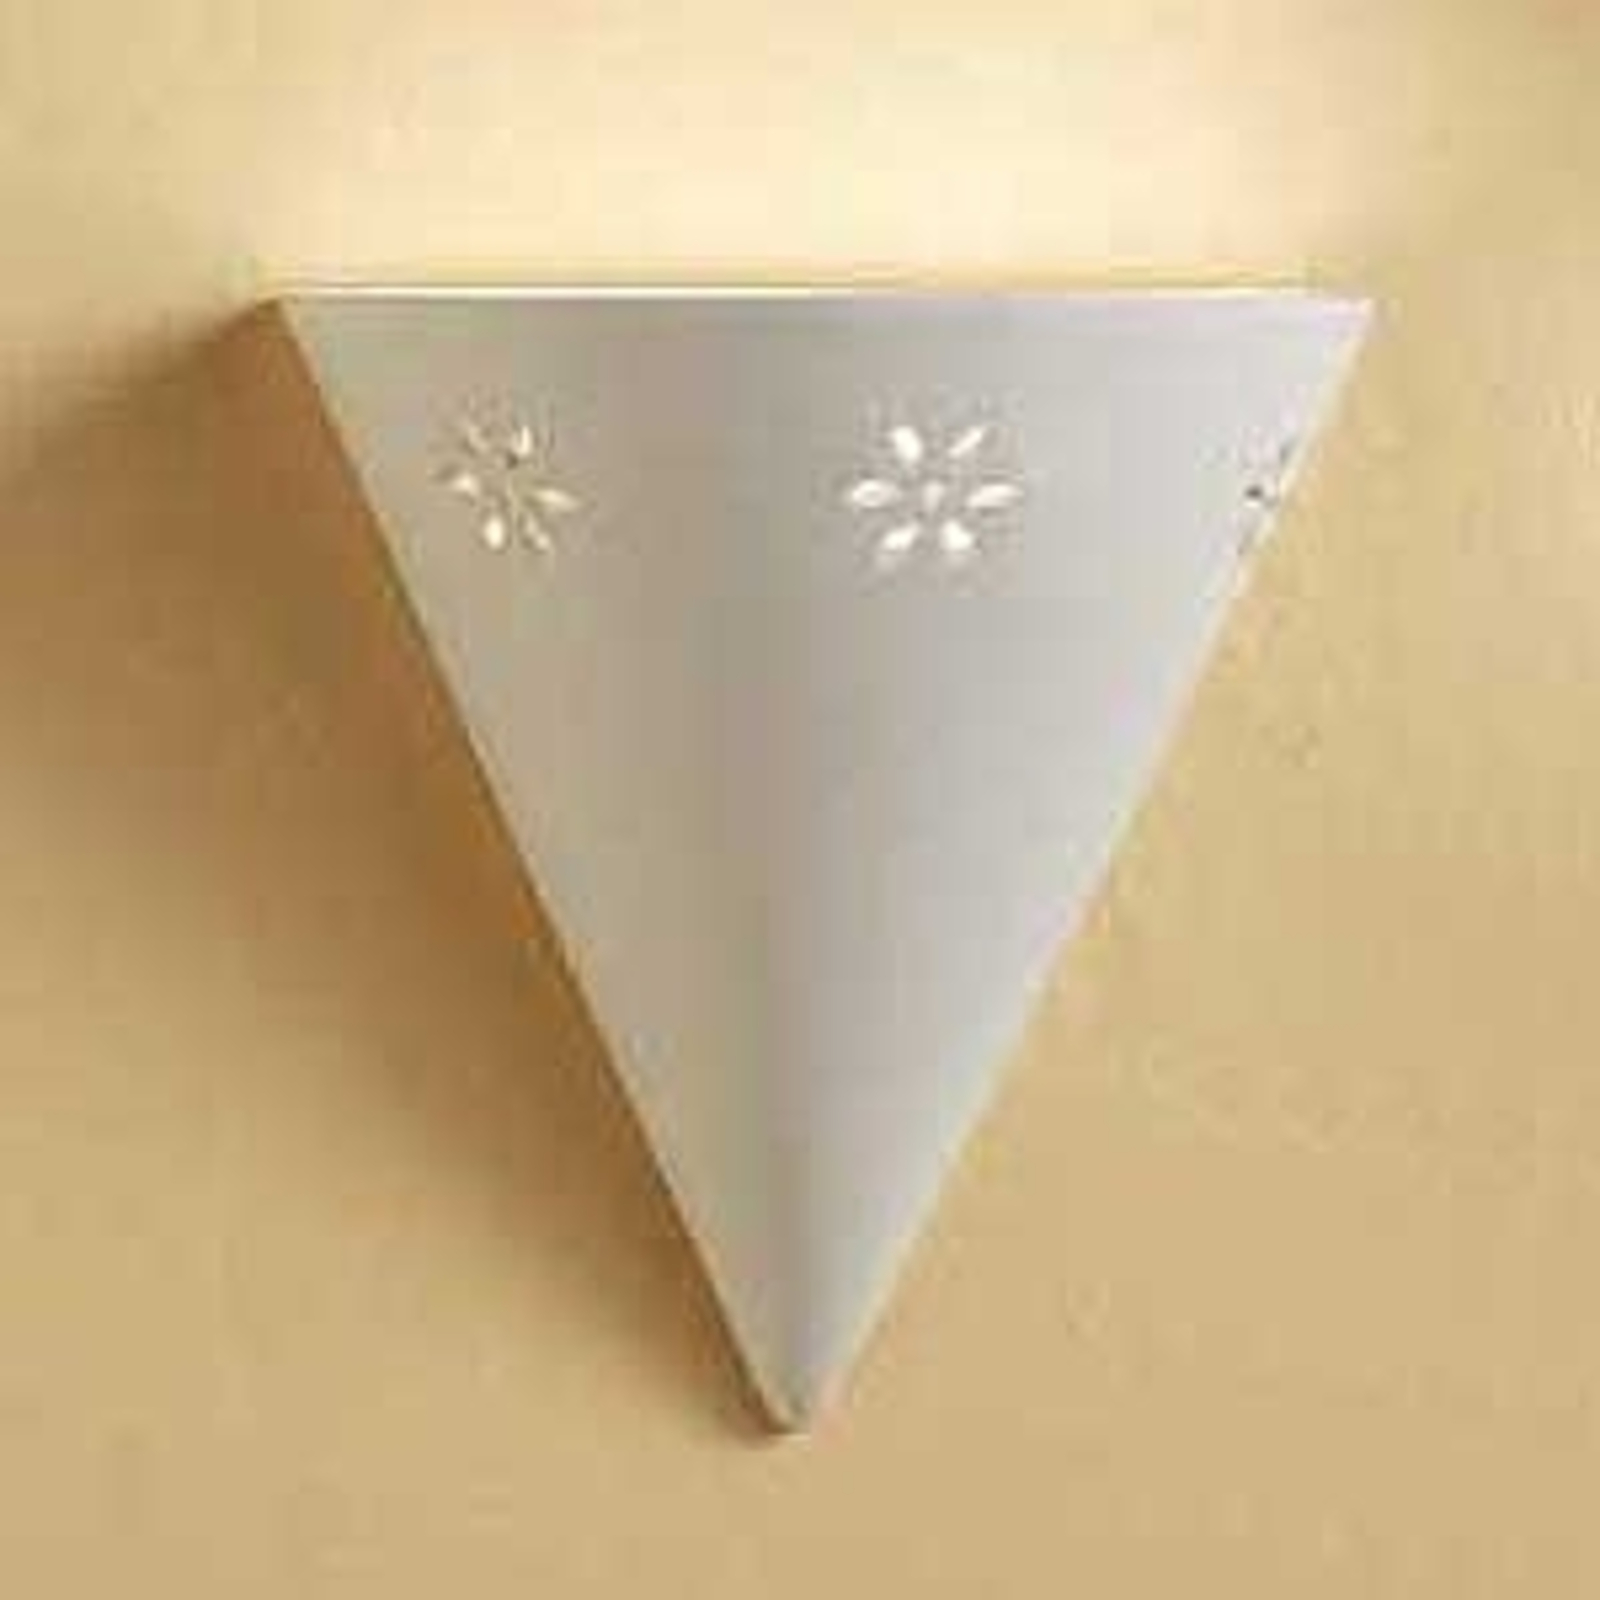 Edel CONO vegglampe i hvit keramikk